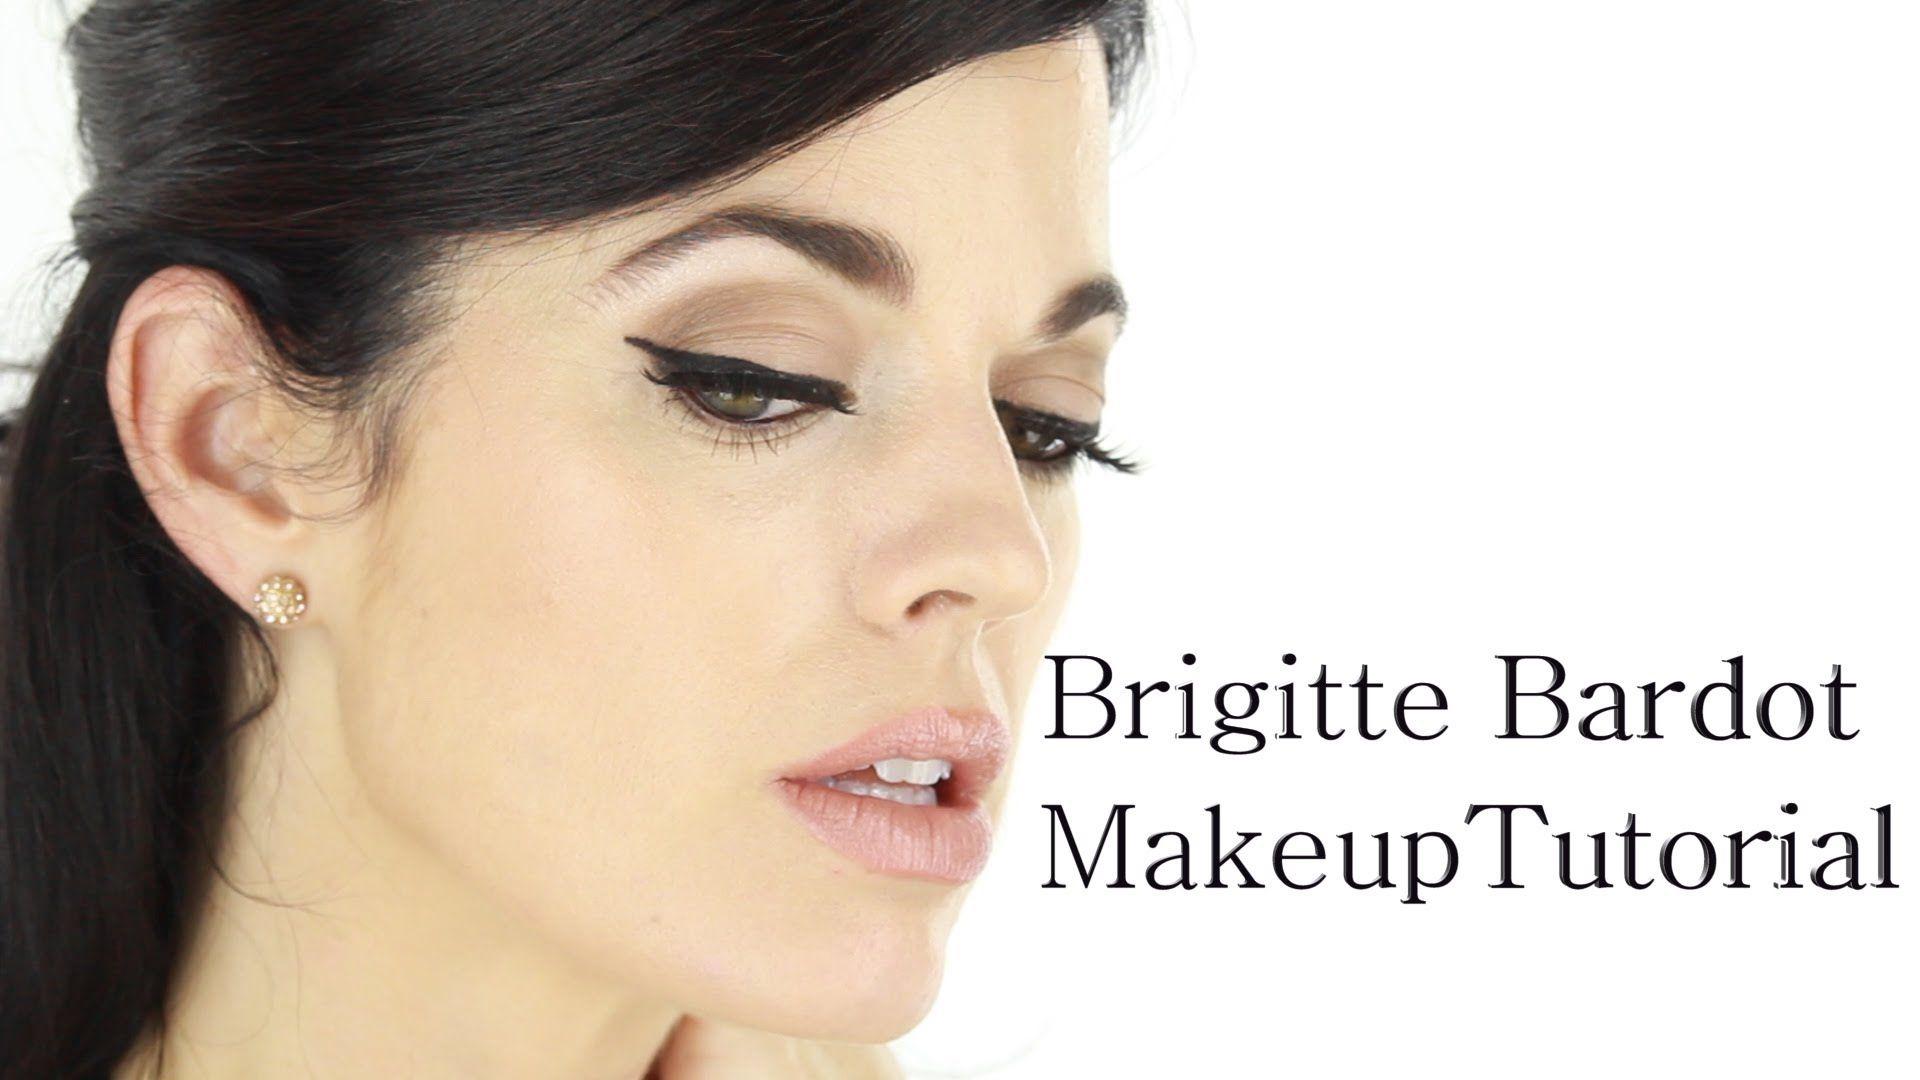 A brunette's take on the Brigitte Bardot signature look ...